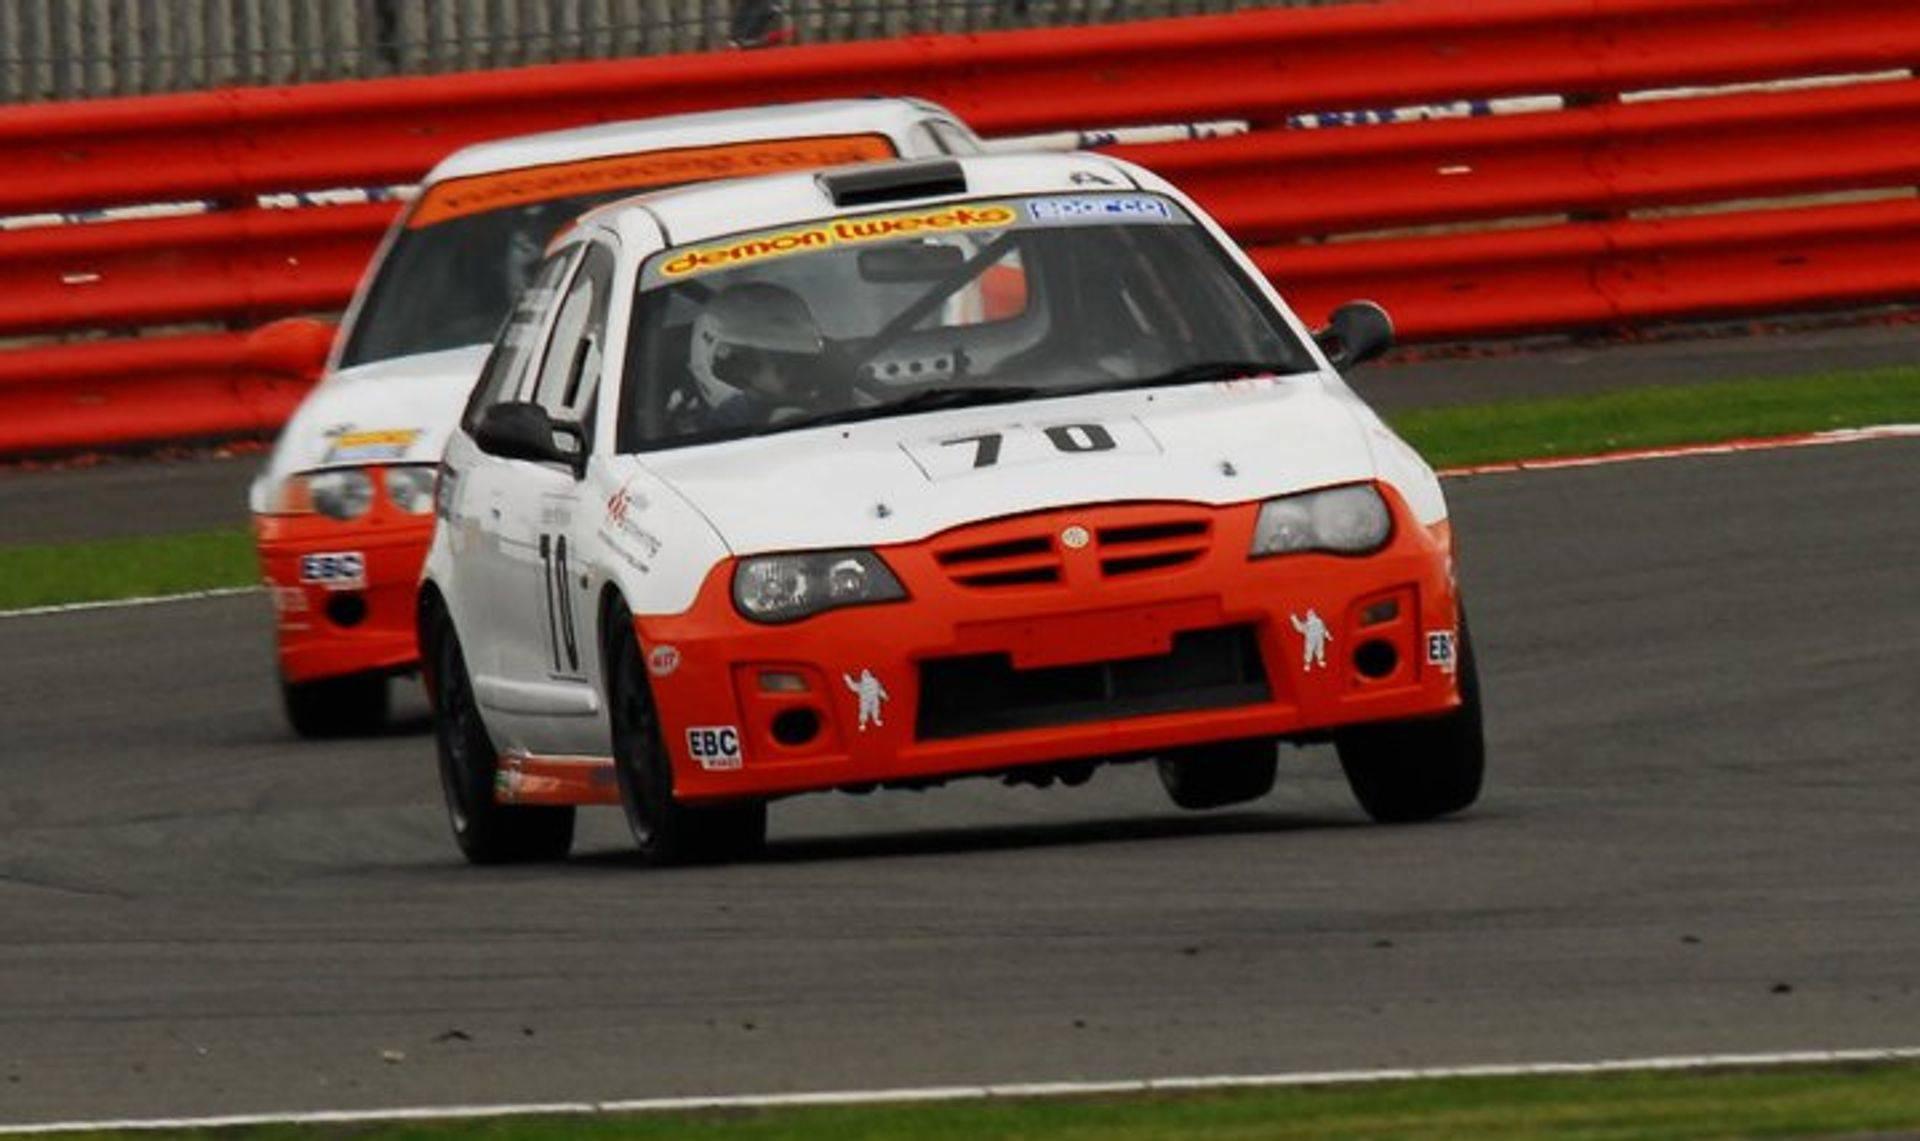 Burchill Ludlow MGCC Champions Vulcan Racing ZR190 ZS 180